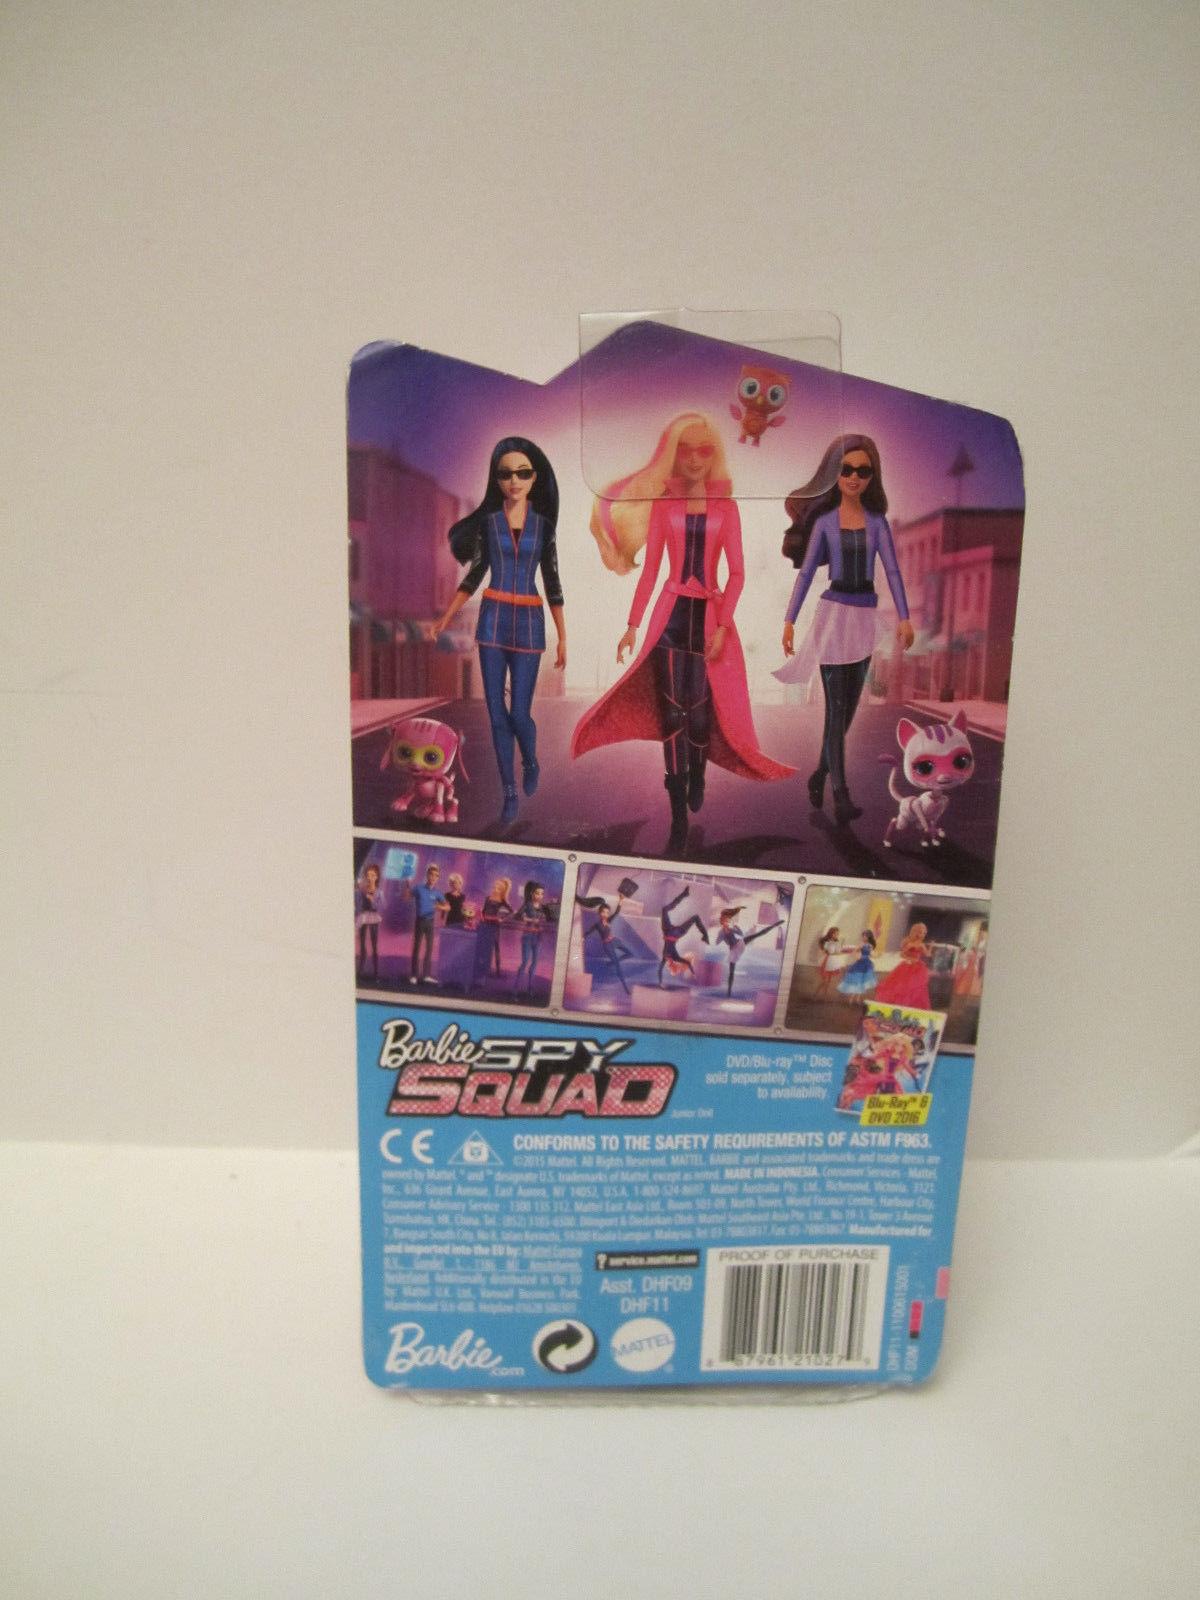 NRFB Barbie Sister Chelsea Barbie Spy Squad Doll Purple 2015 New Brunette Hair image 3